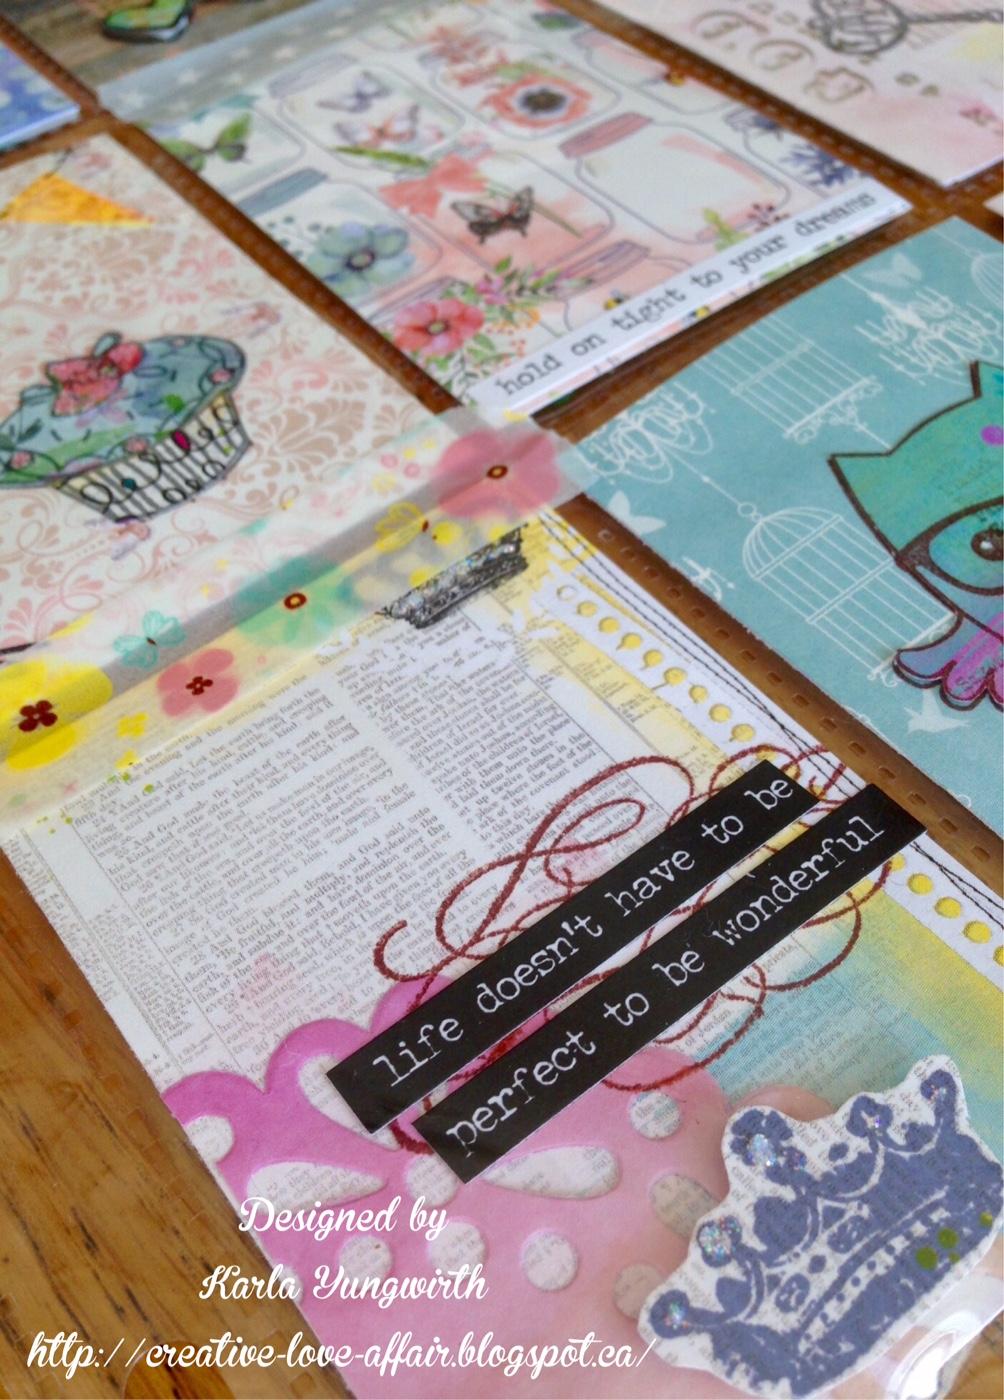 Creative Love Affair Pocket Letter Using Scrapbook Supplies